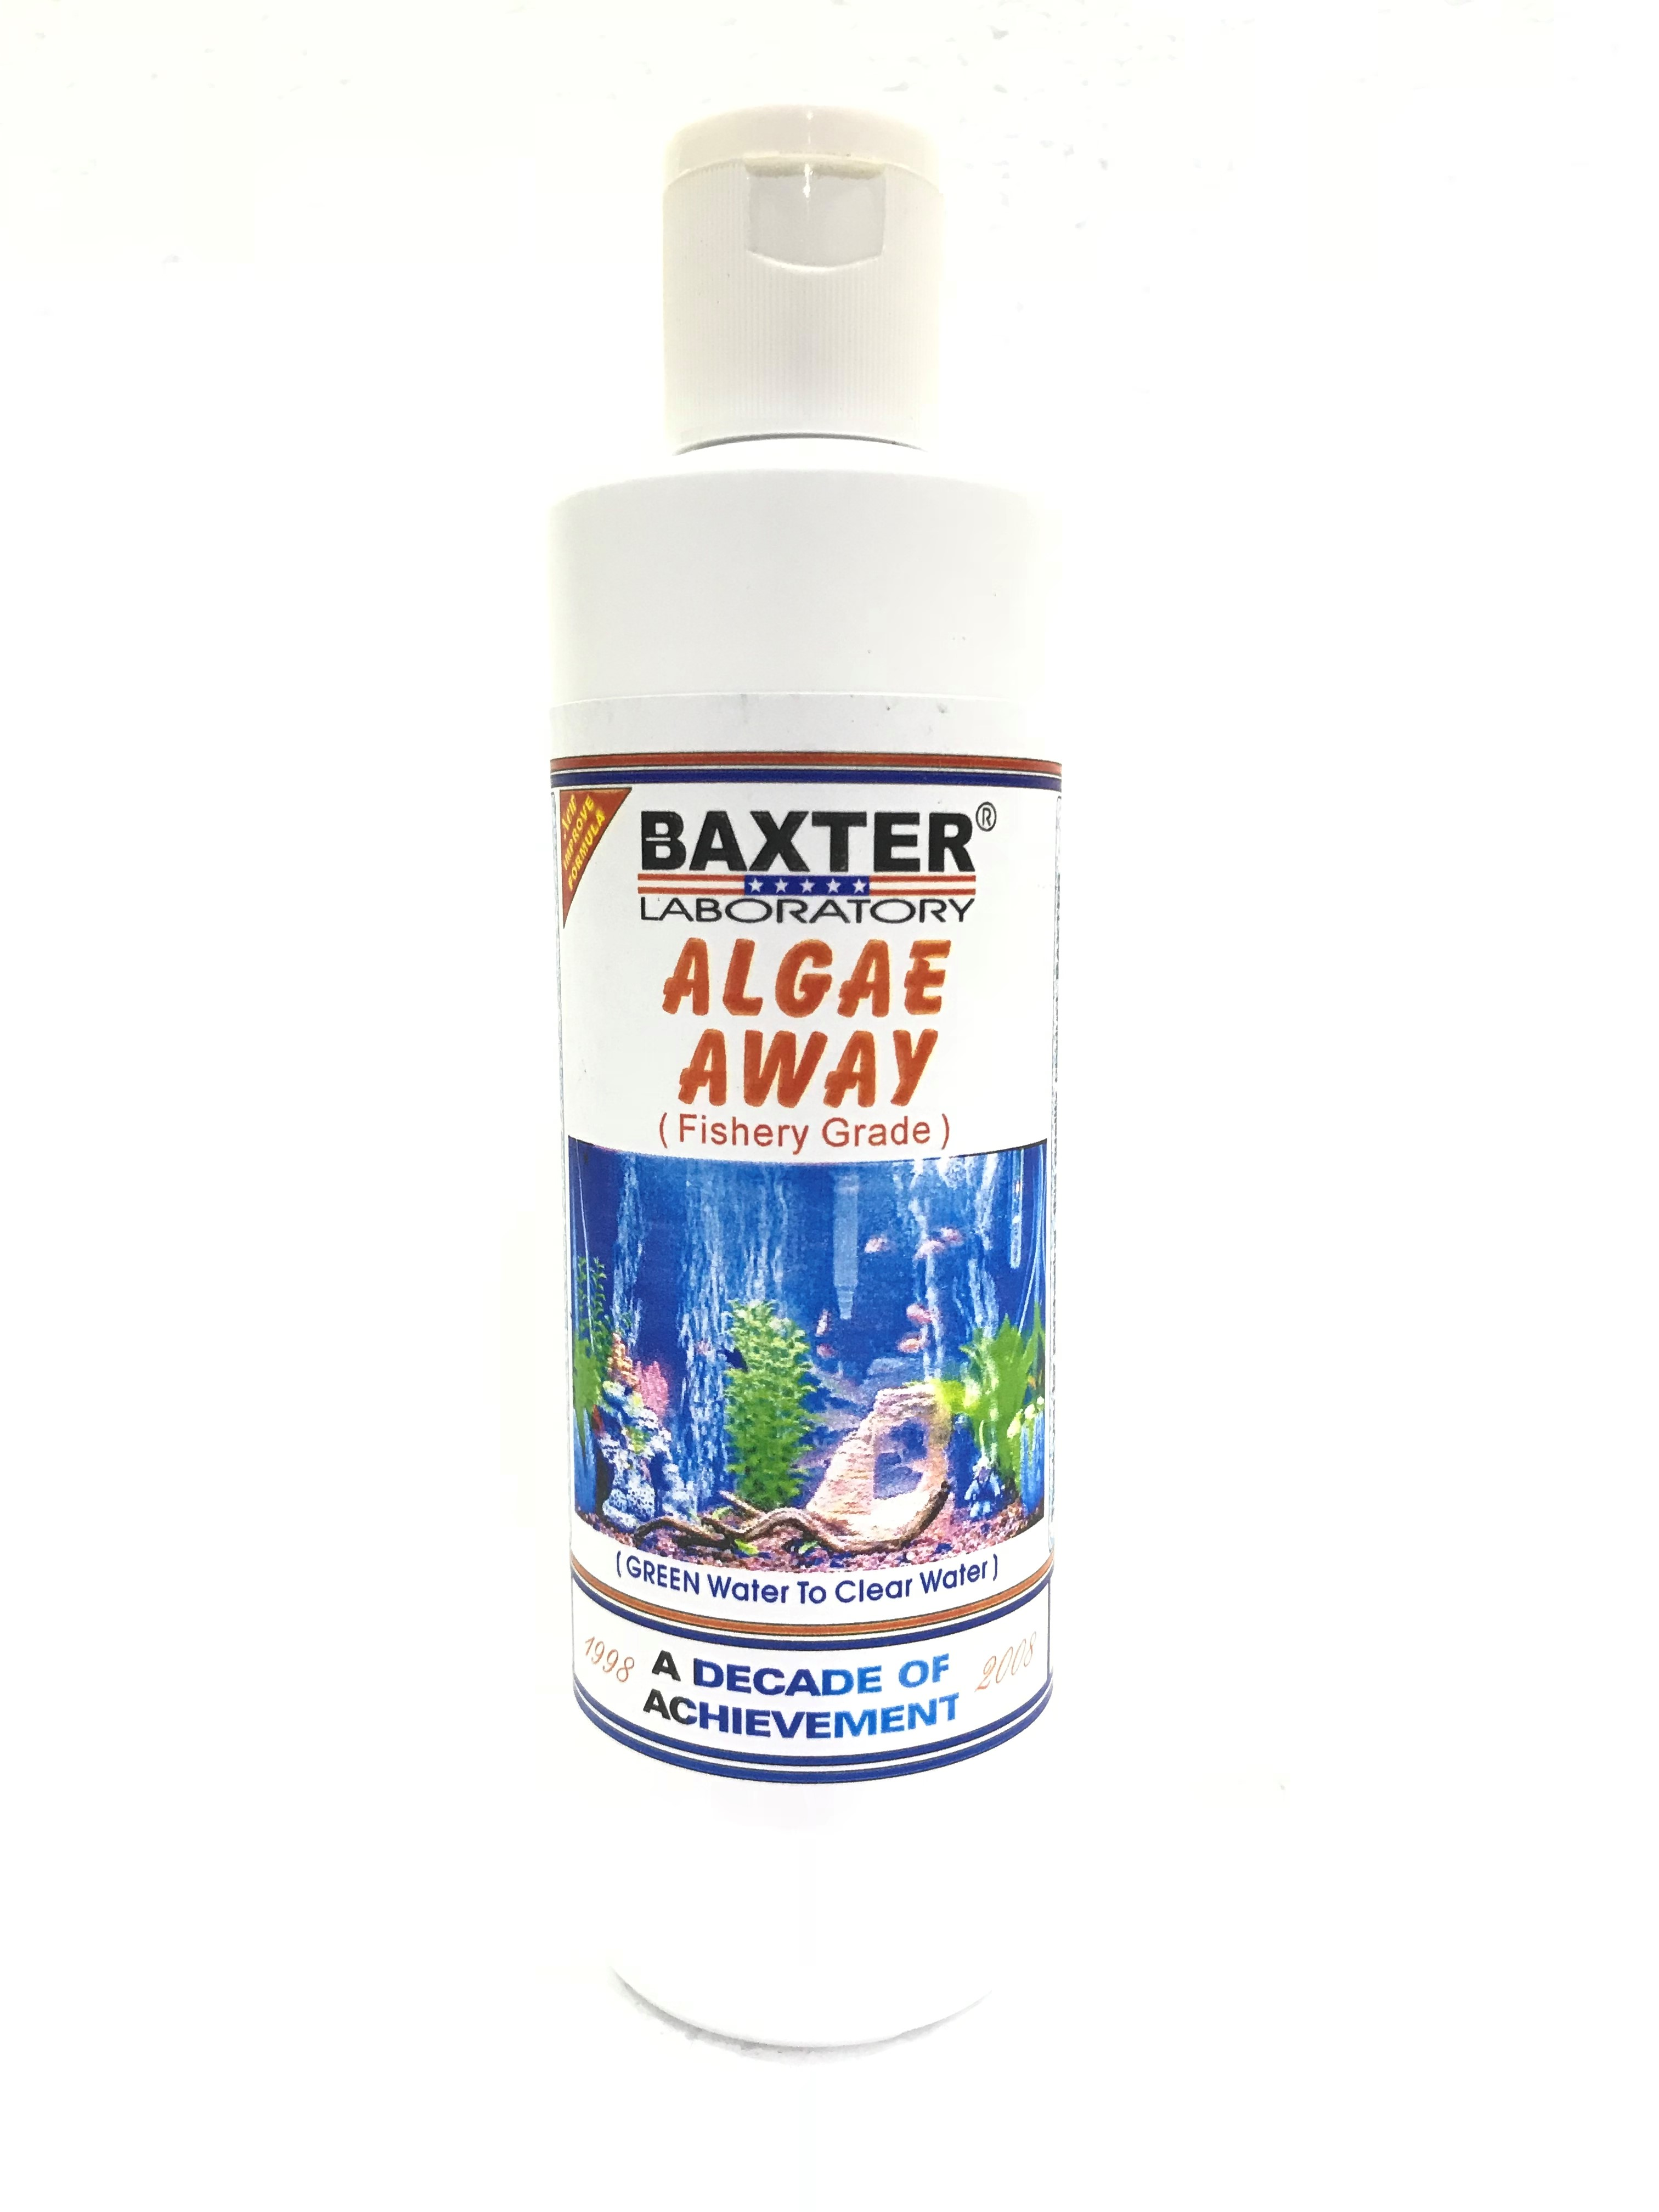 Baxter Algae Away ( Fishery Grade )